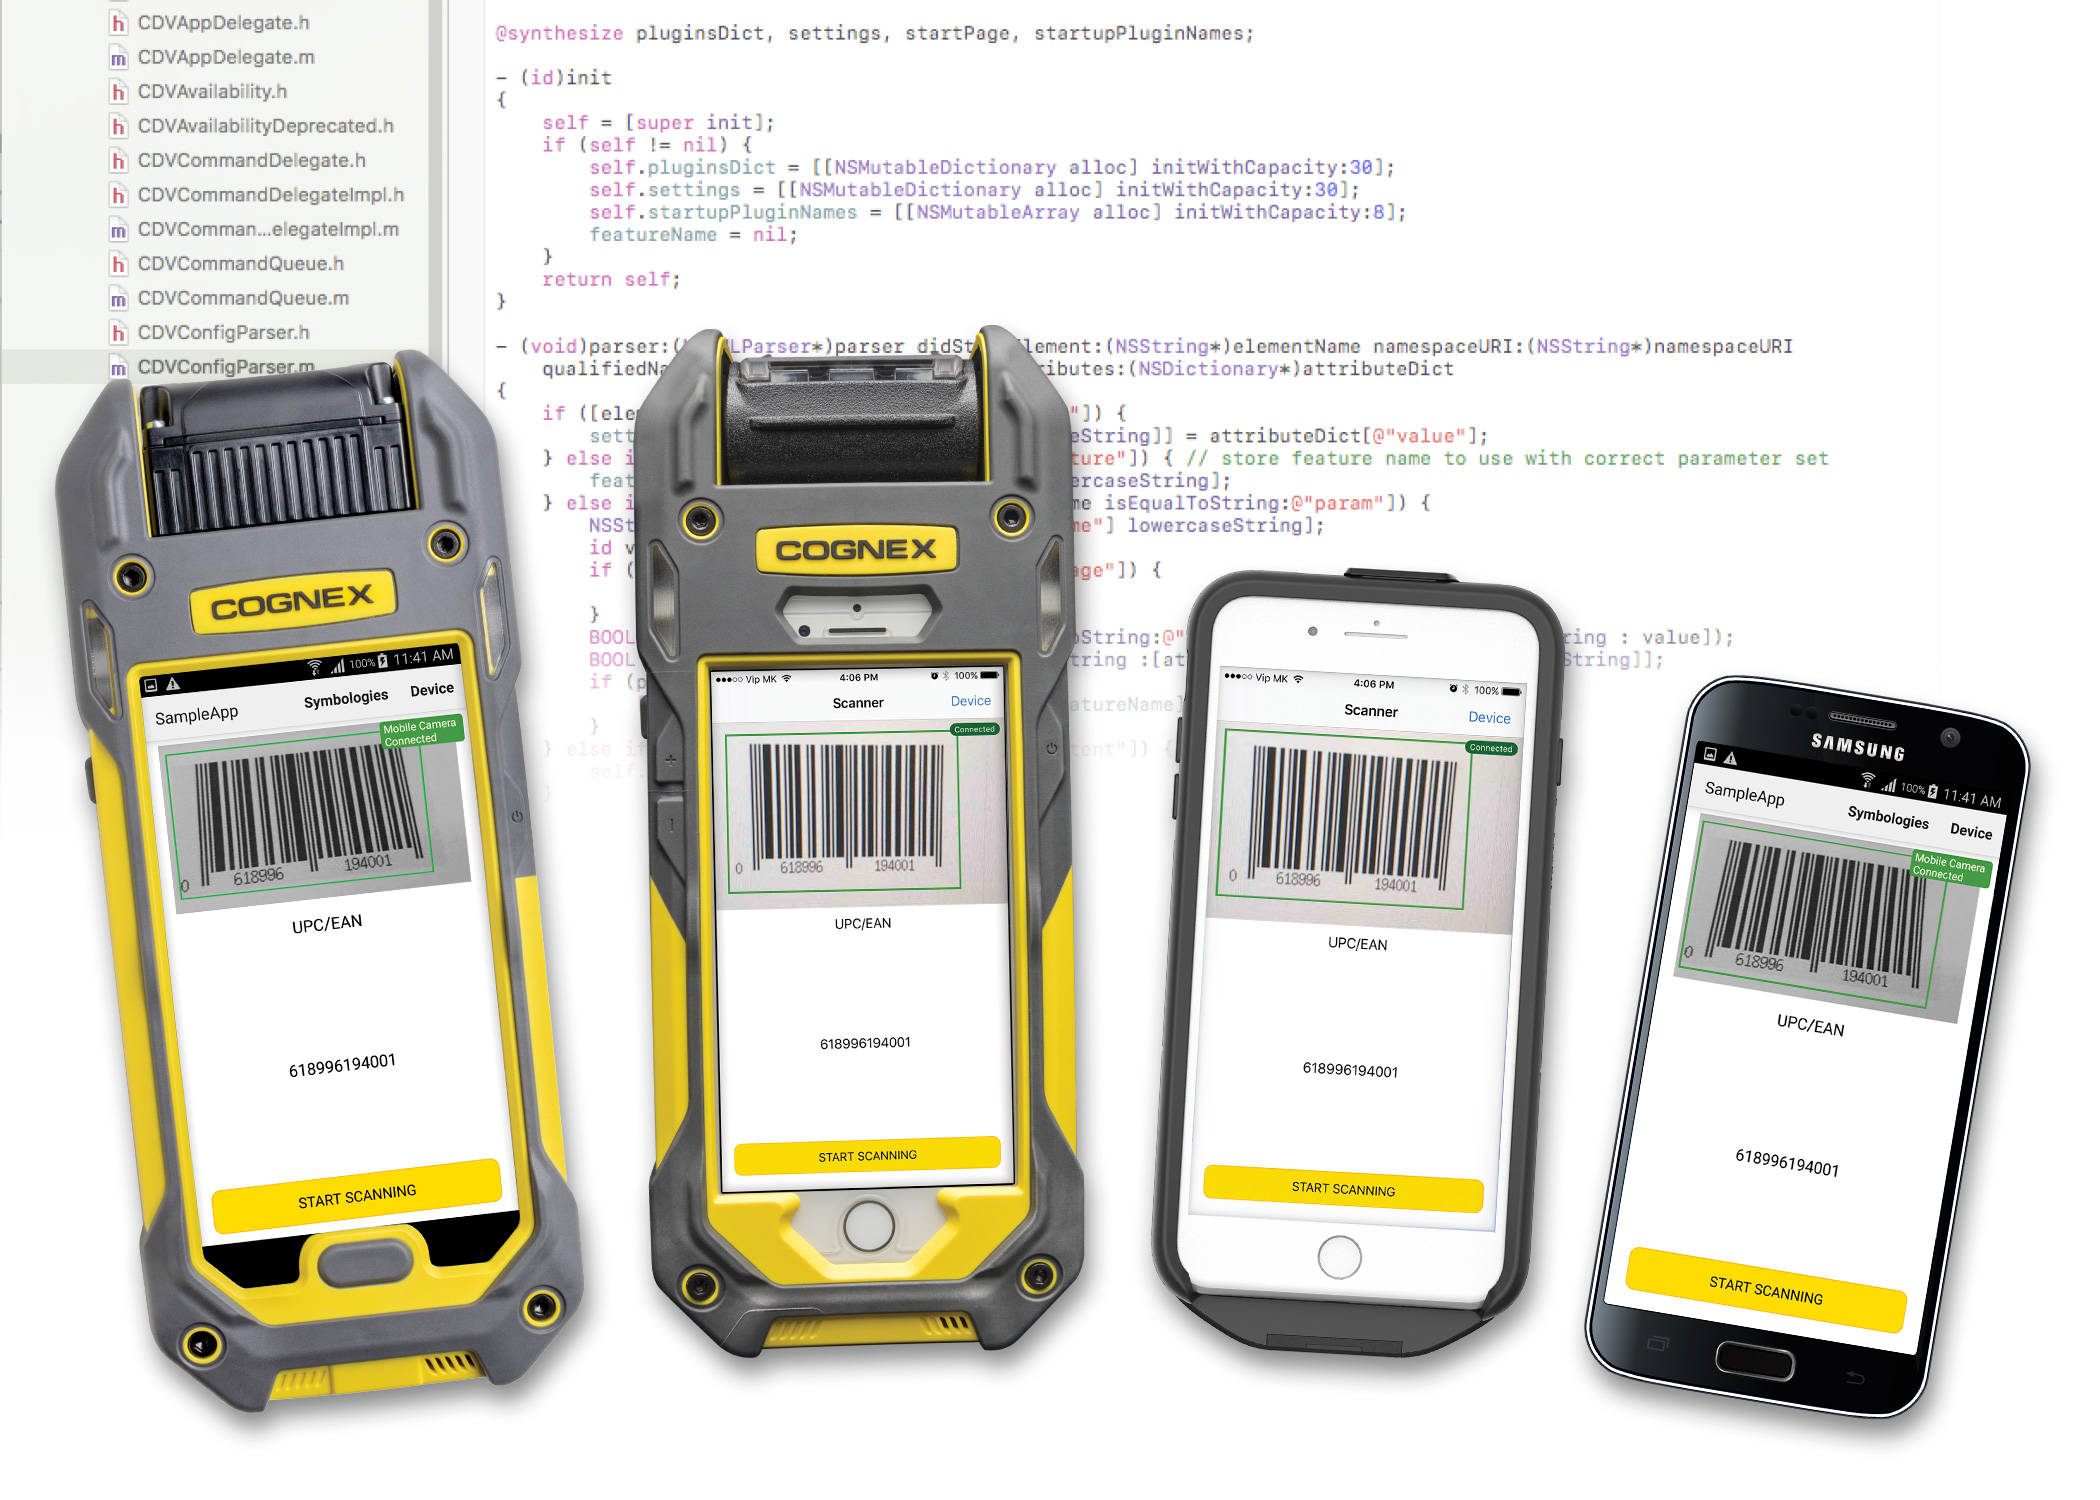 Cognex Delivers Comprehensive Mobile Barcode Reading Solutions